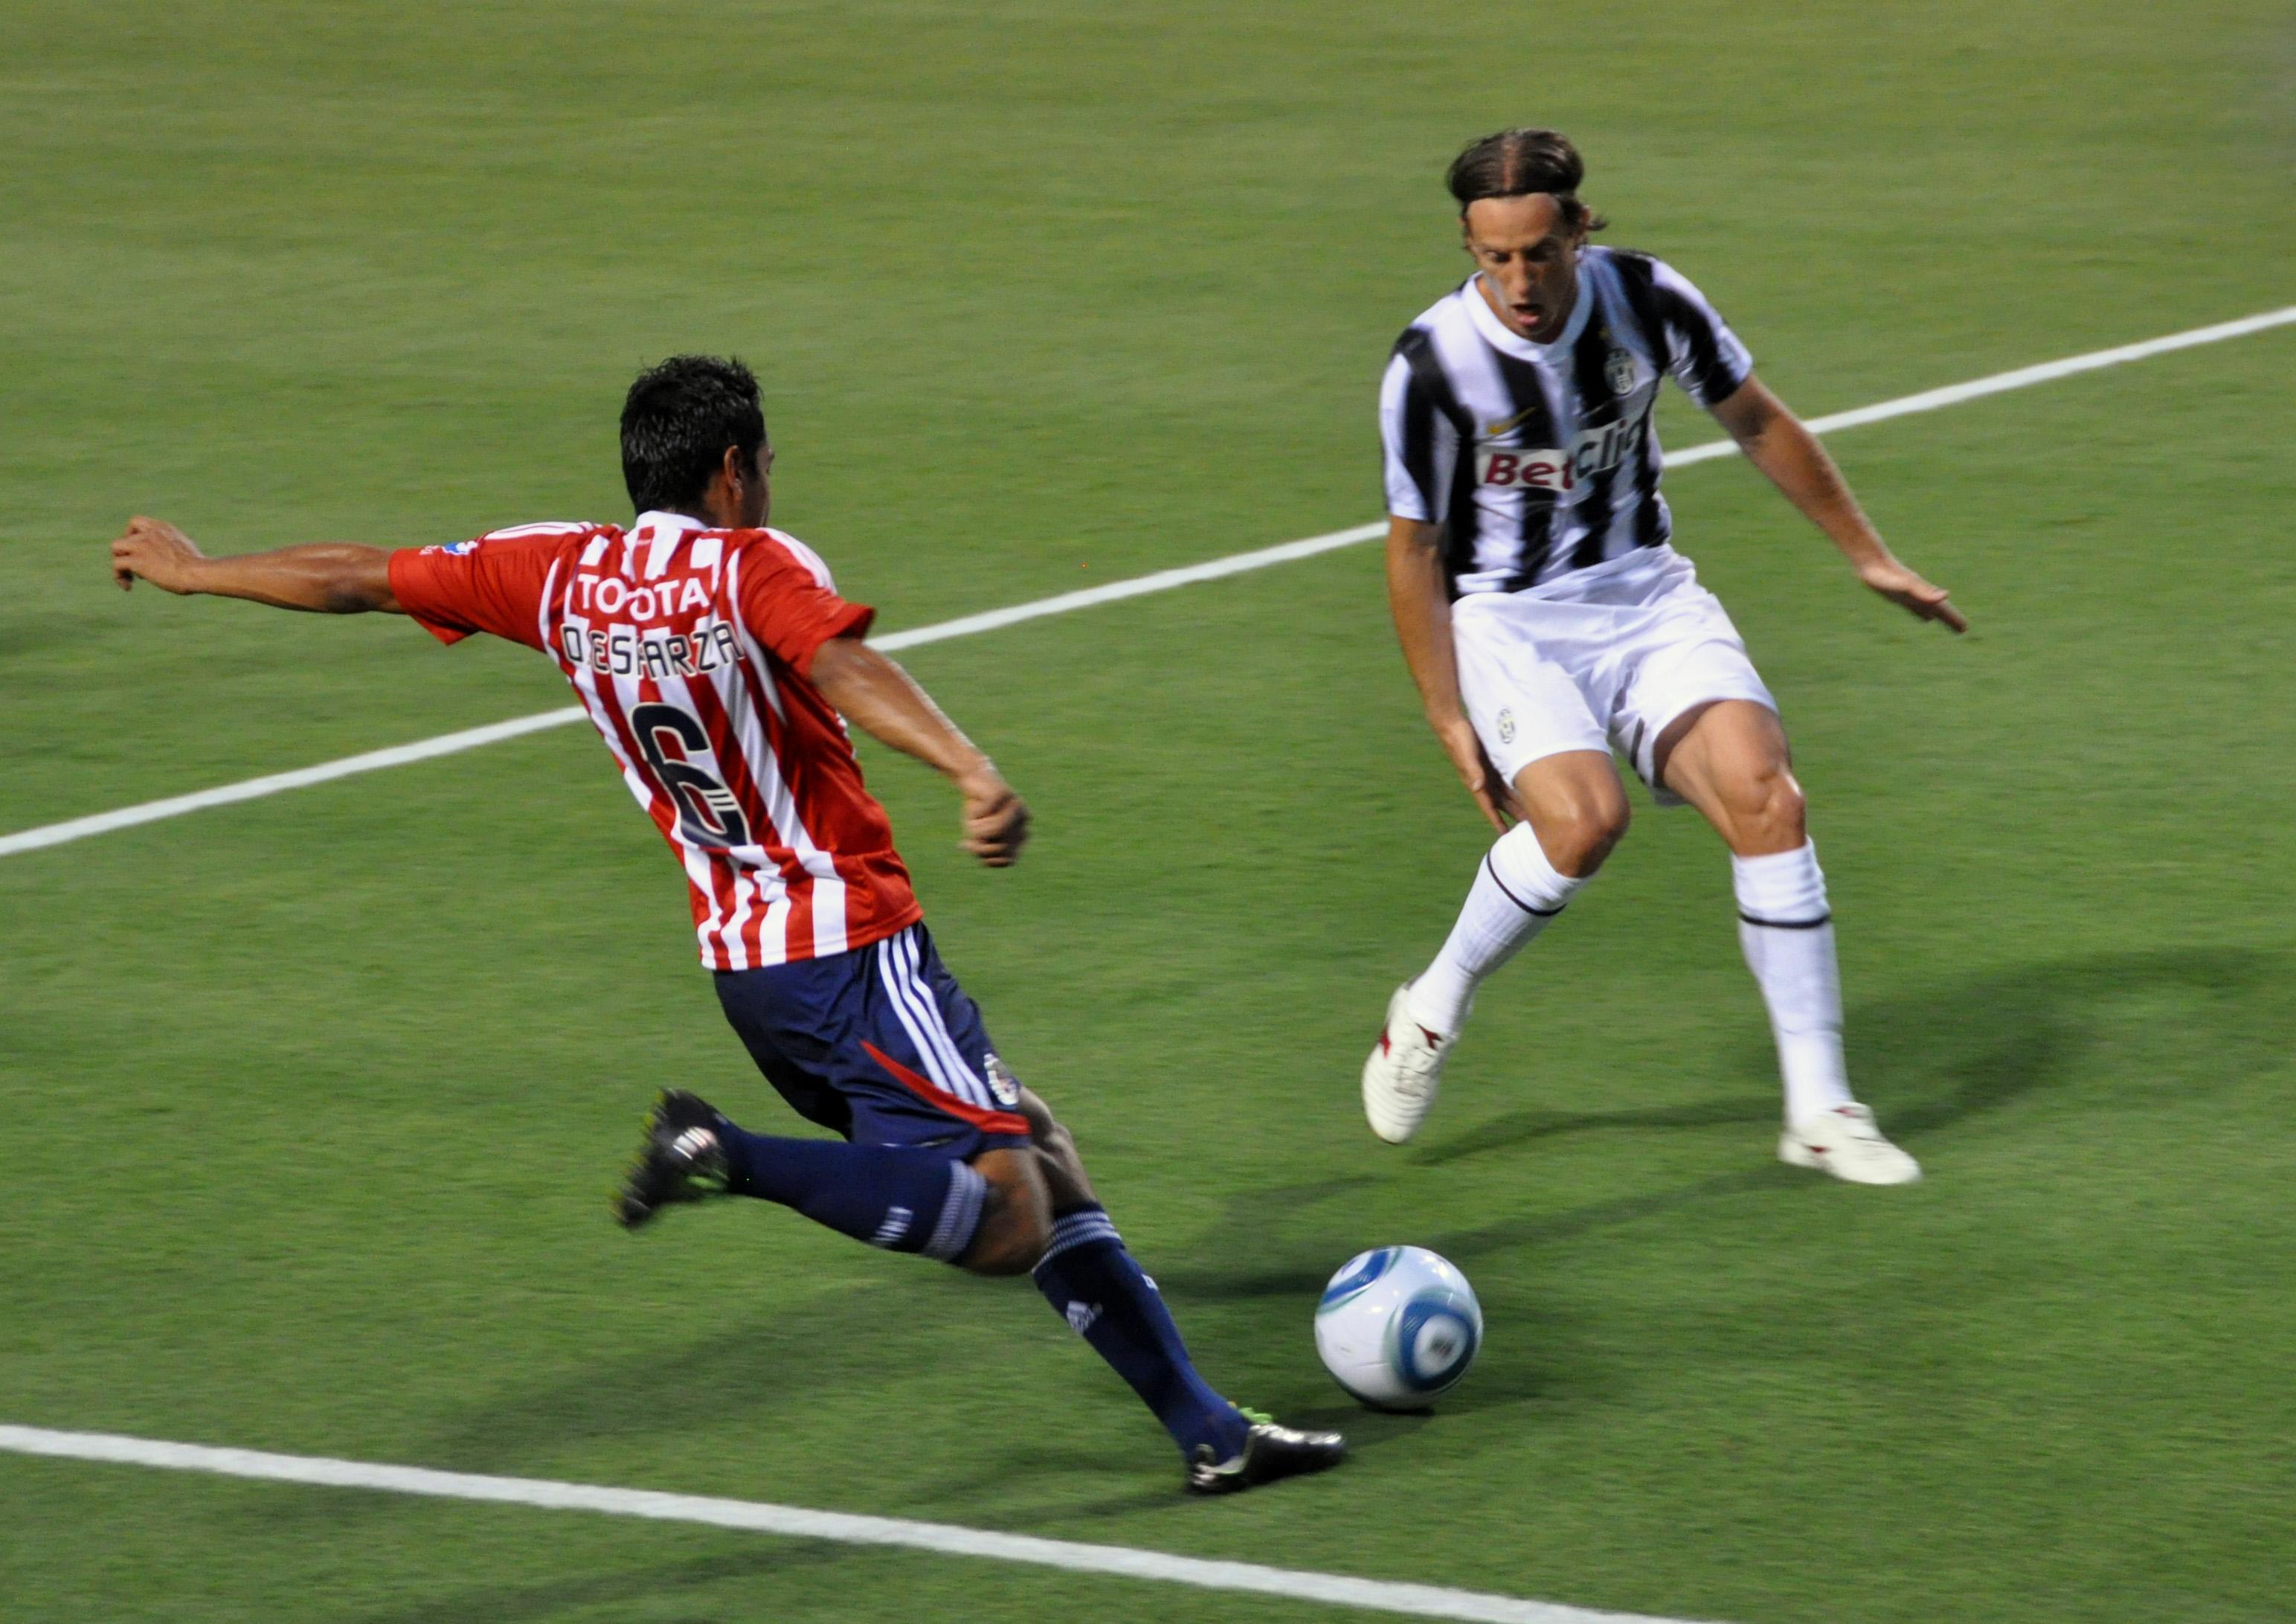 Juventus Fc: File:Guadalajara Chivas Vs Juventus FC, 2011, Reto Ziegler